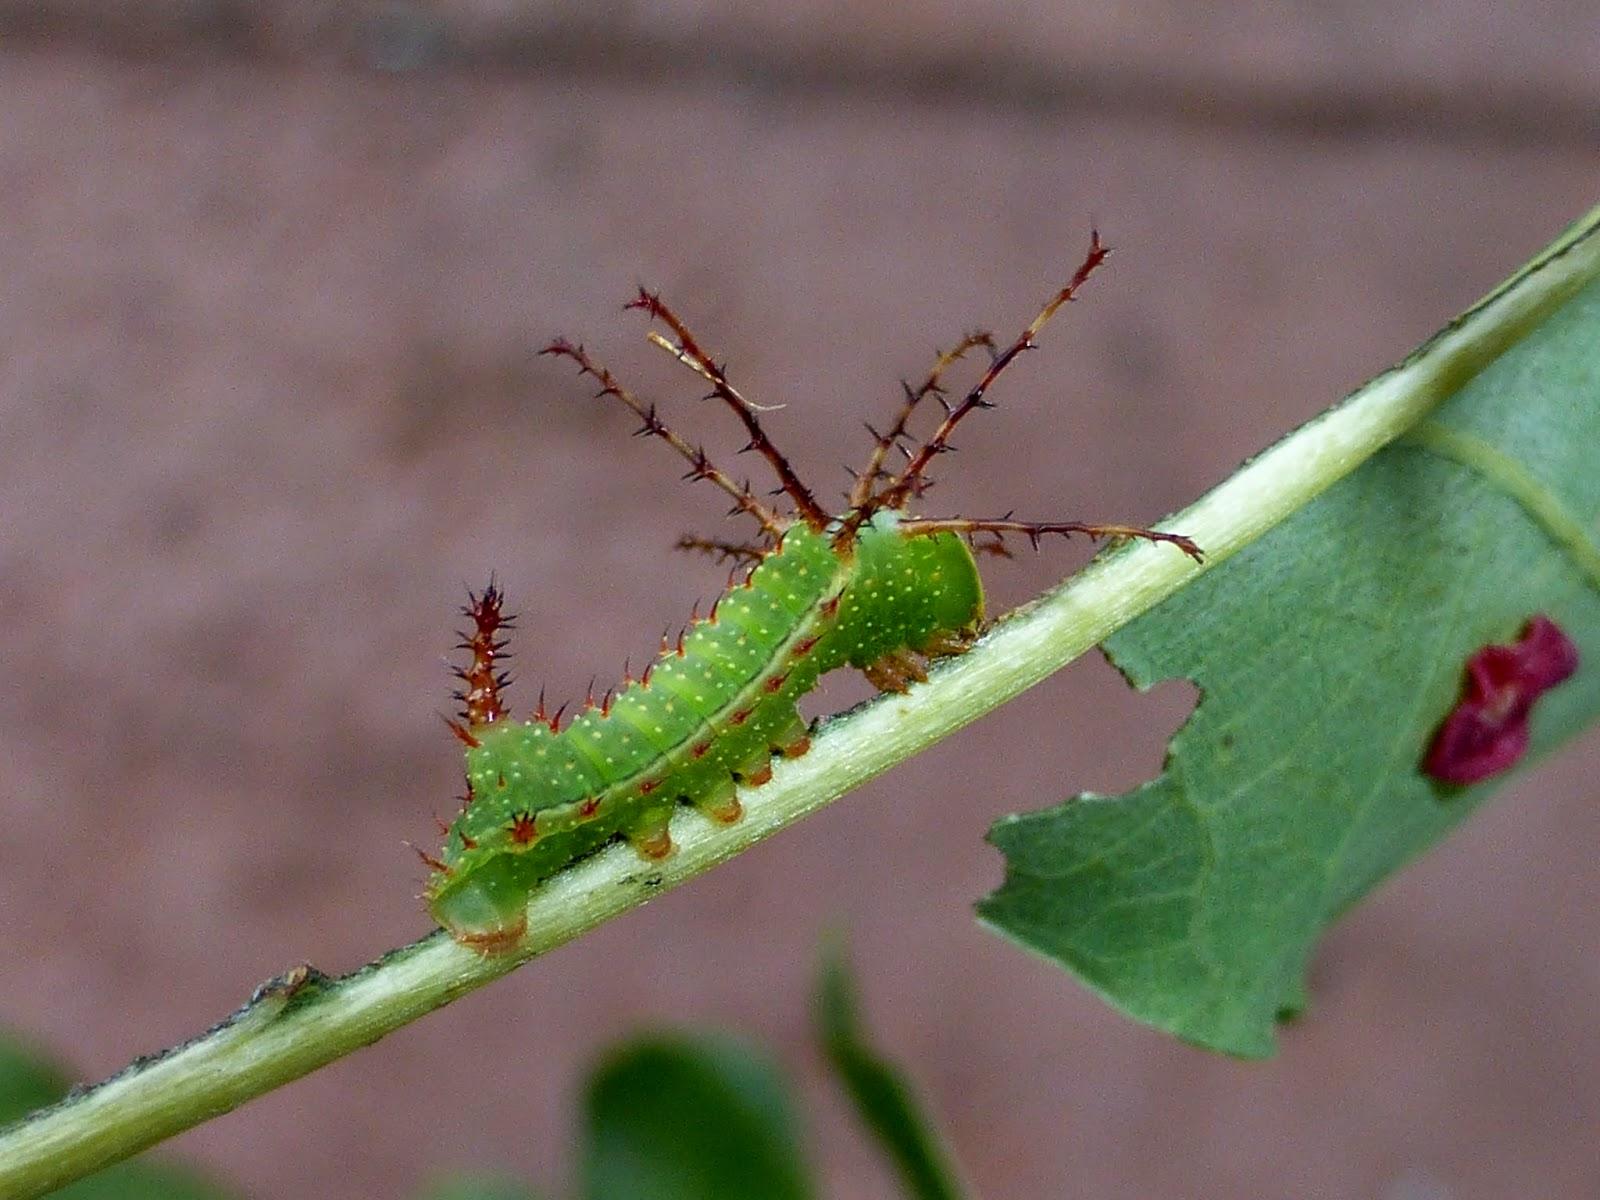 Syssphinx molina caterpillar